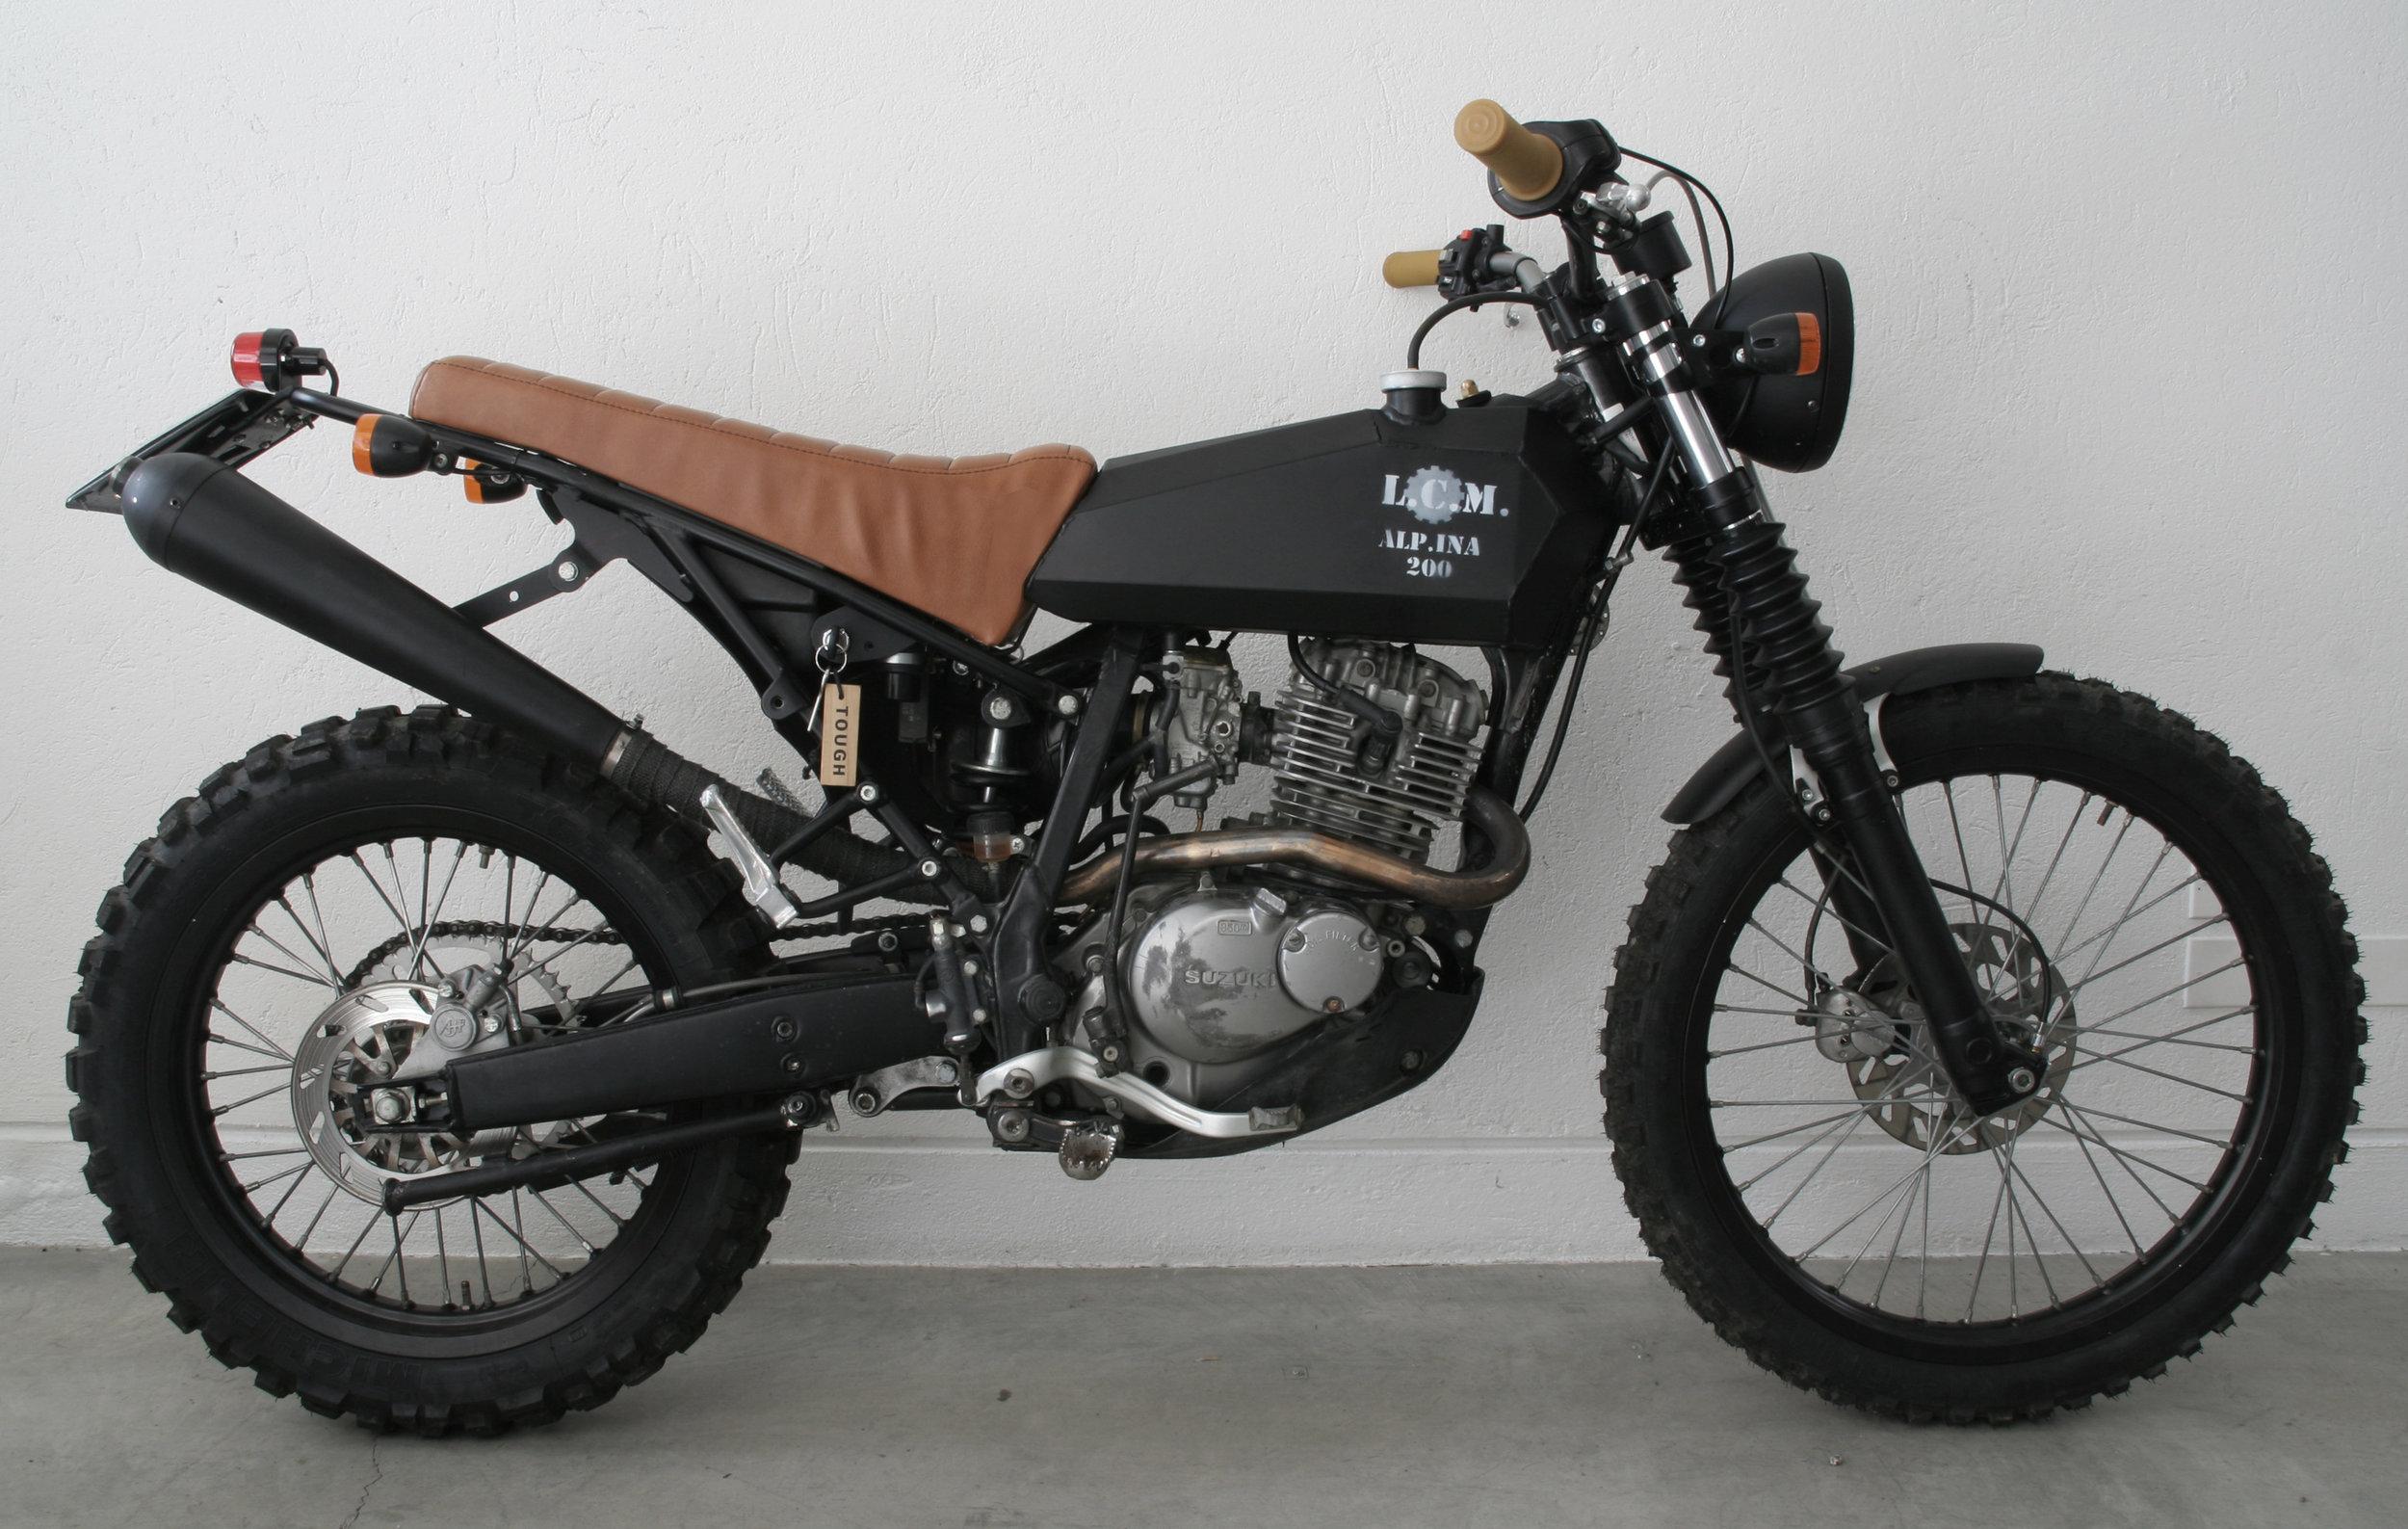 Luogocomune Motorcycles bikes customized